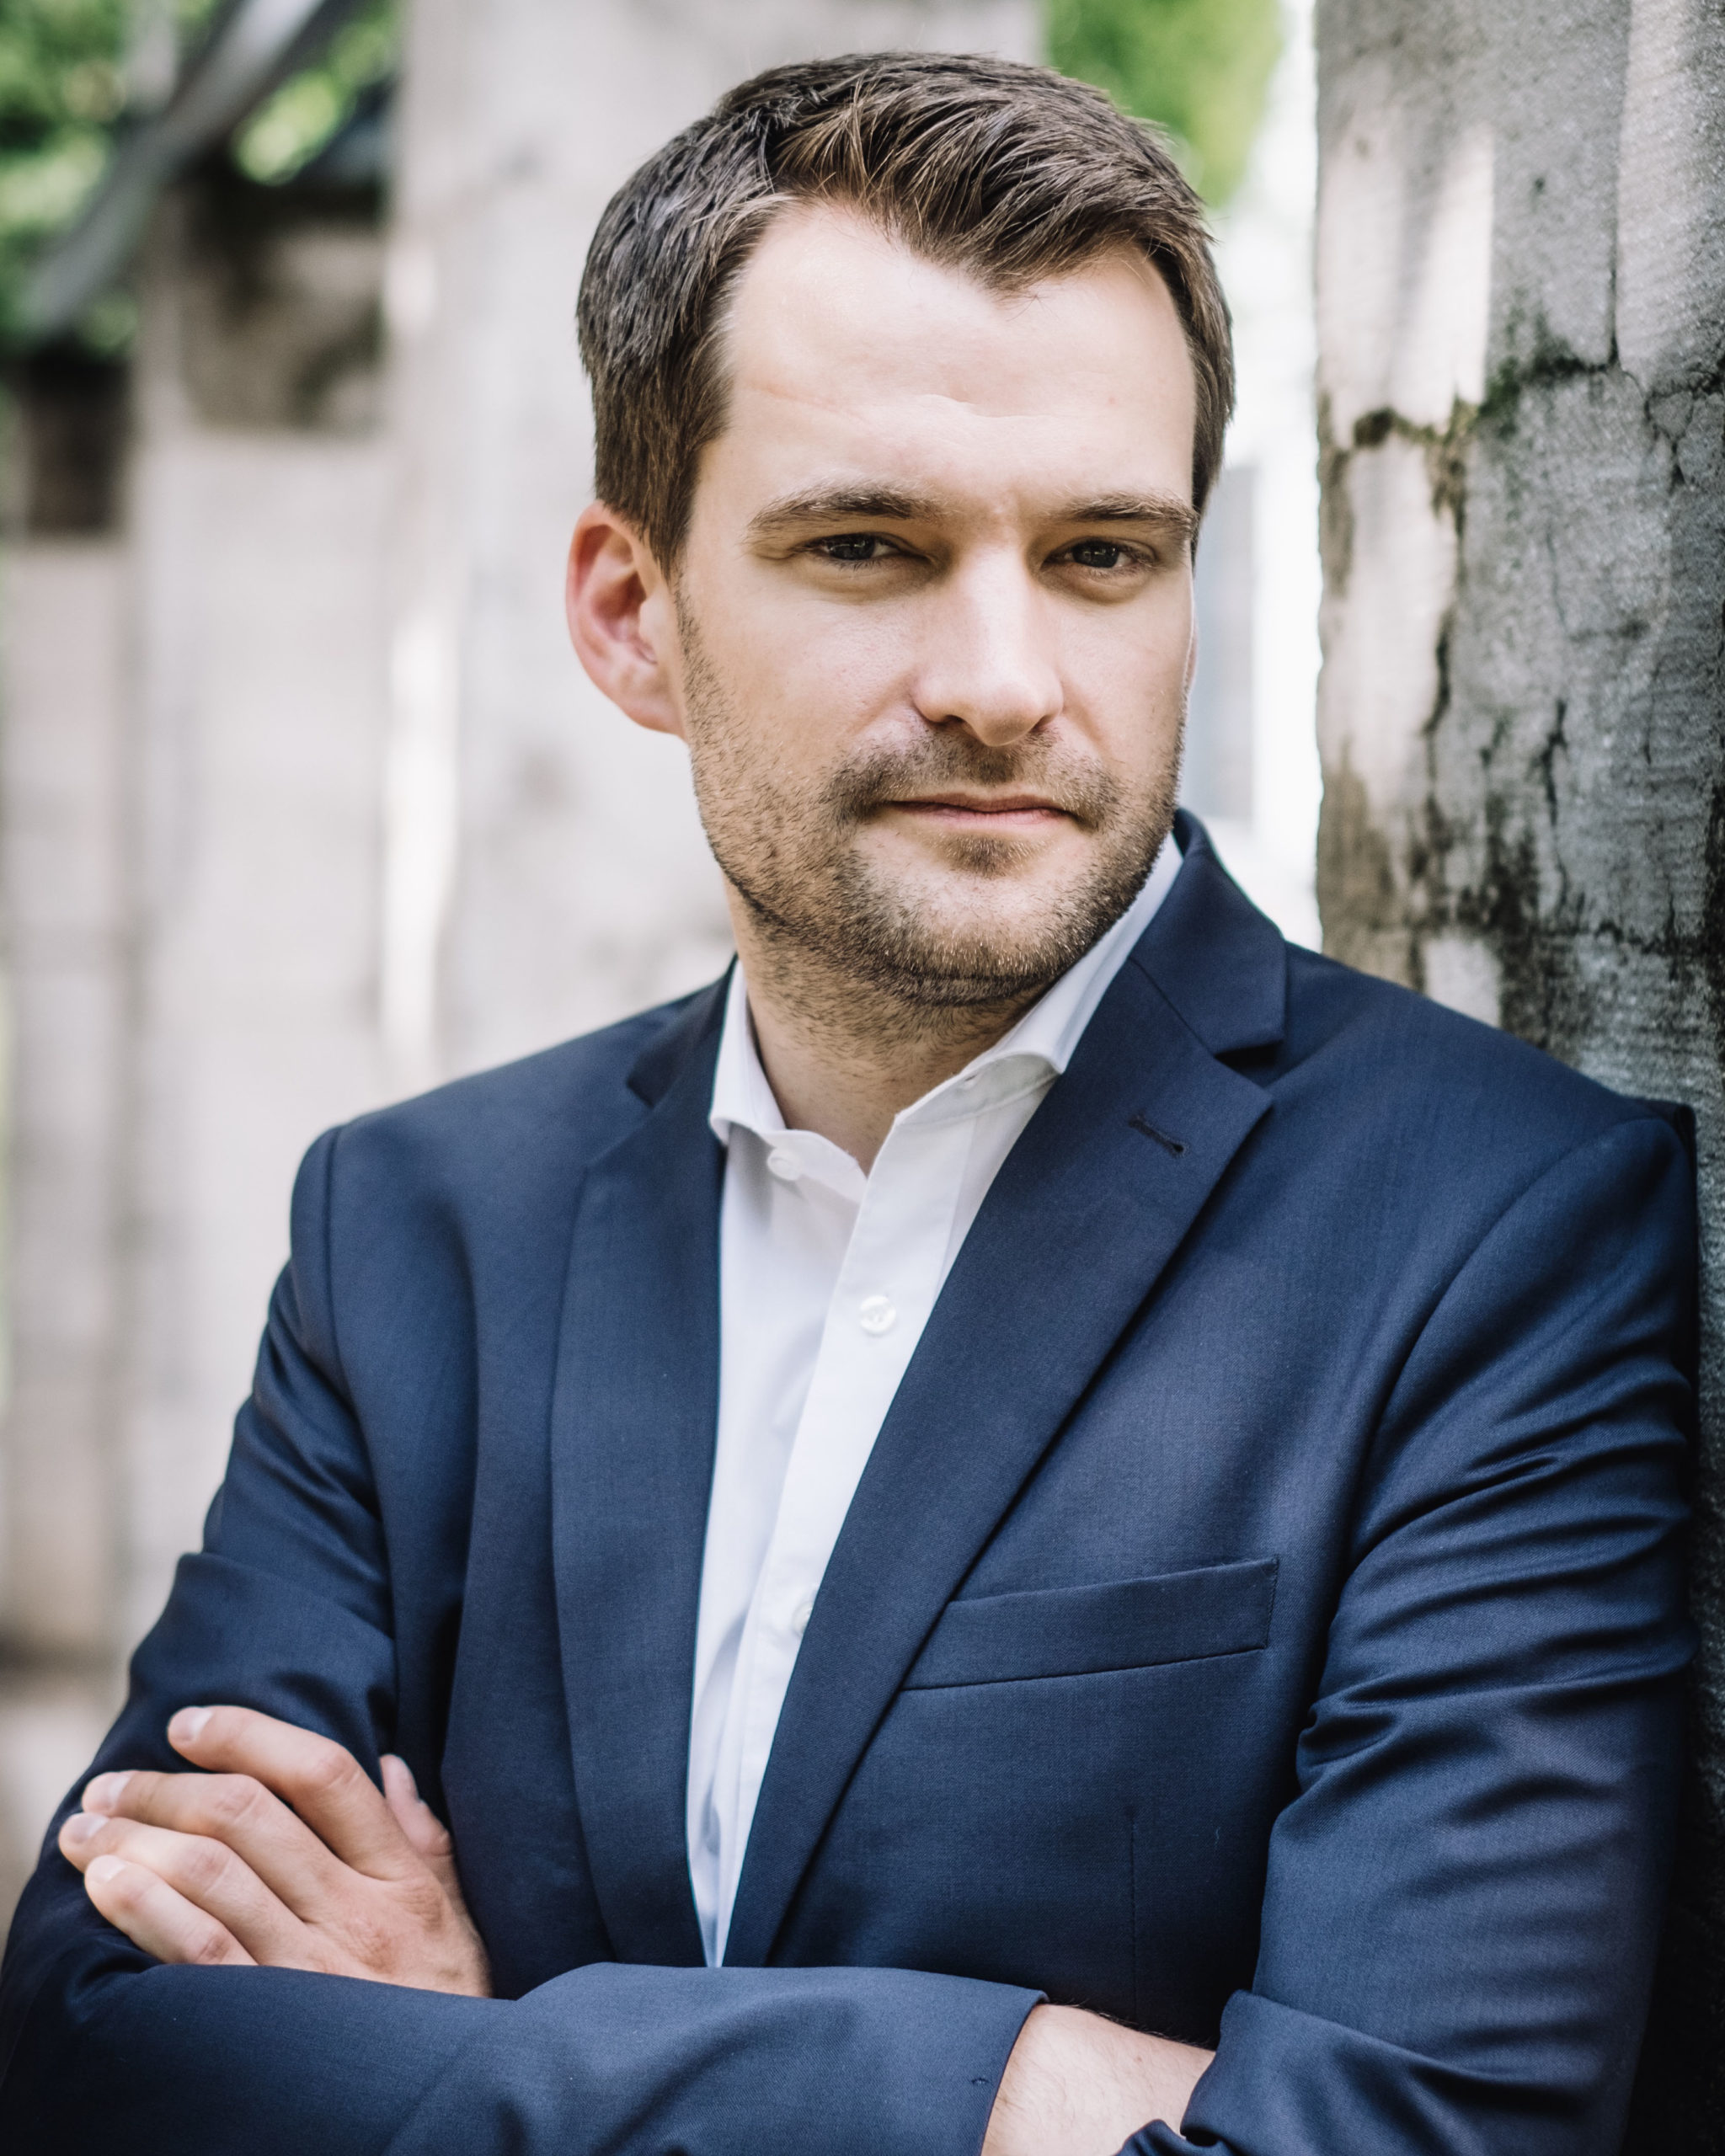 Johannes Vogel, MdB